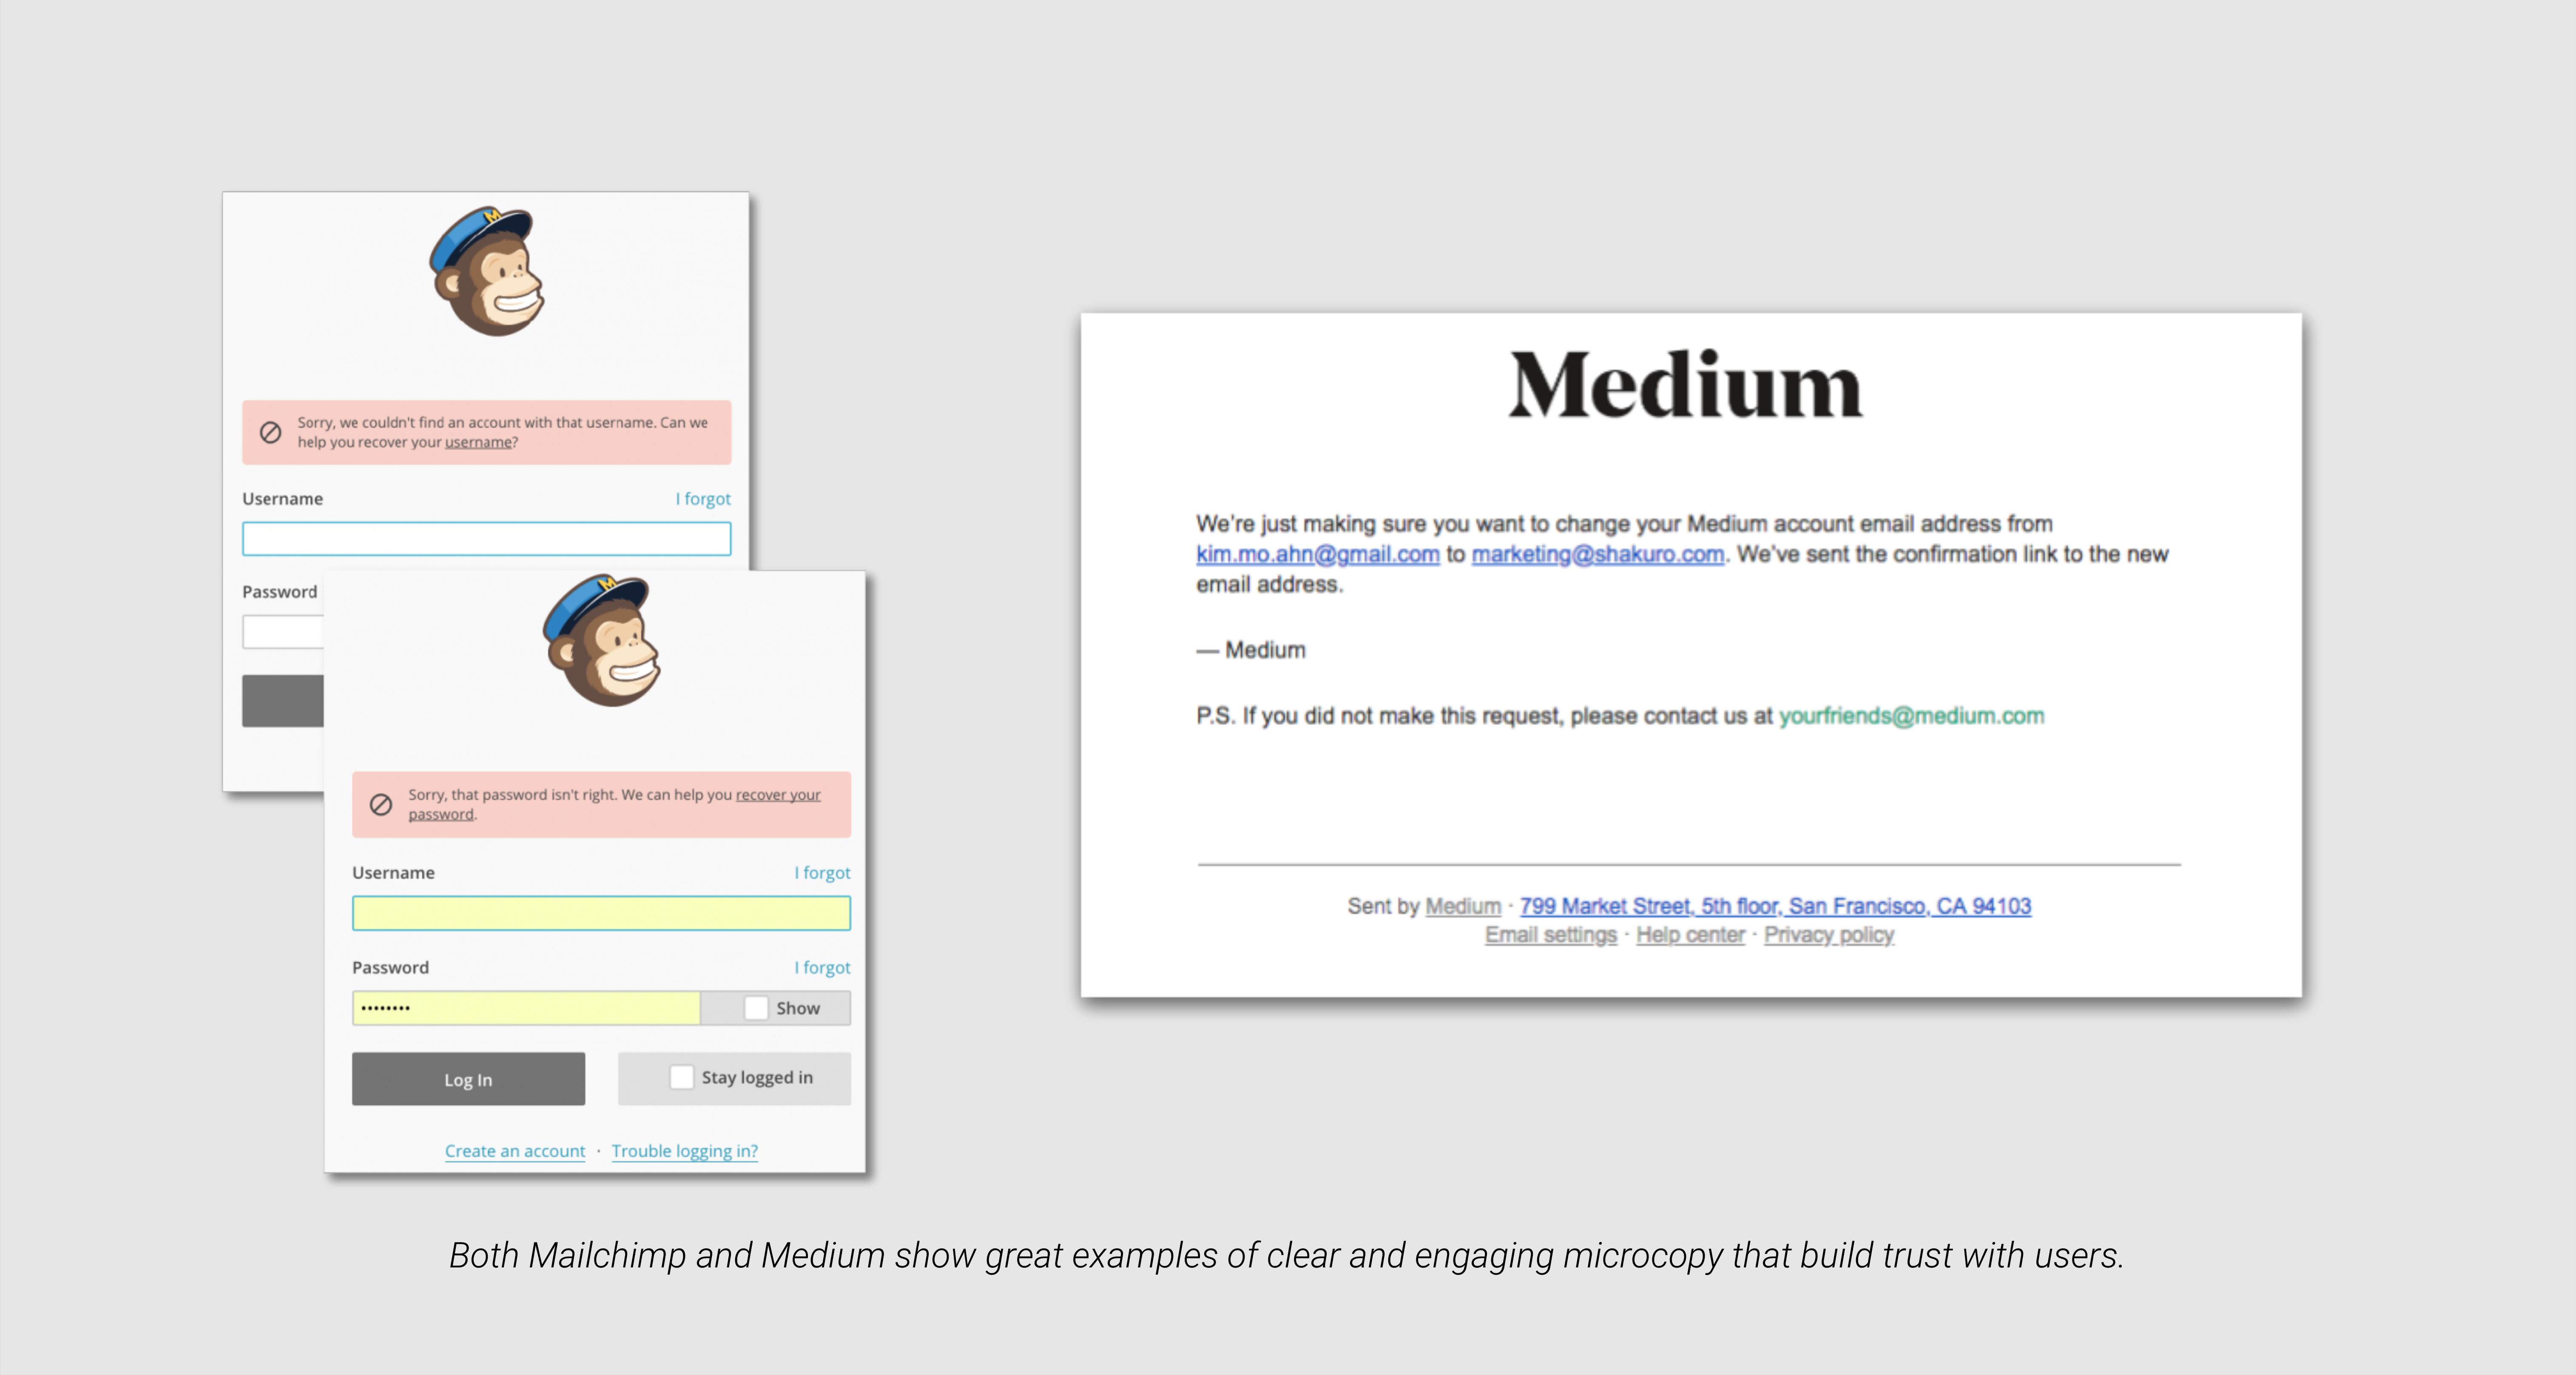 microcopy mailchimp medium example tavano team